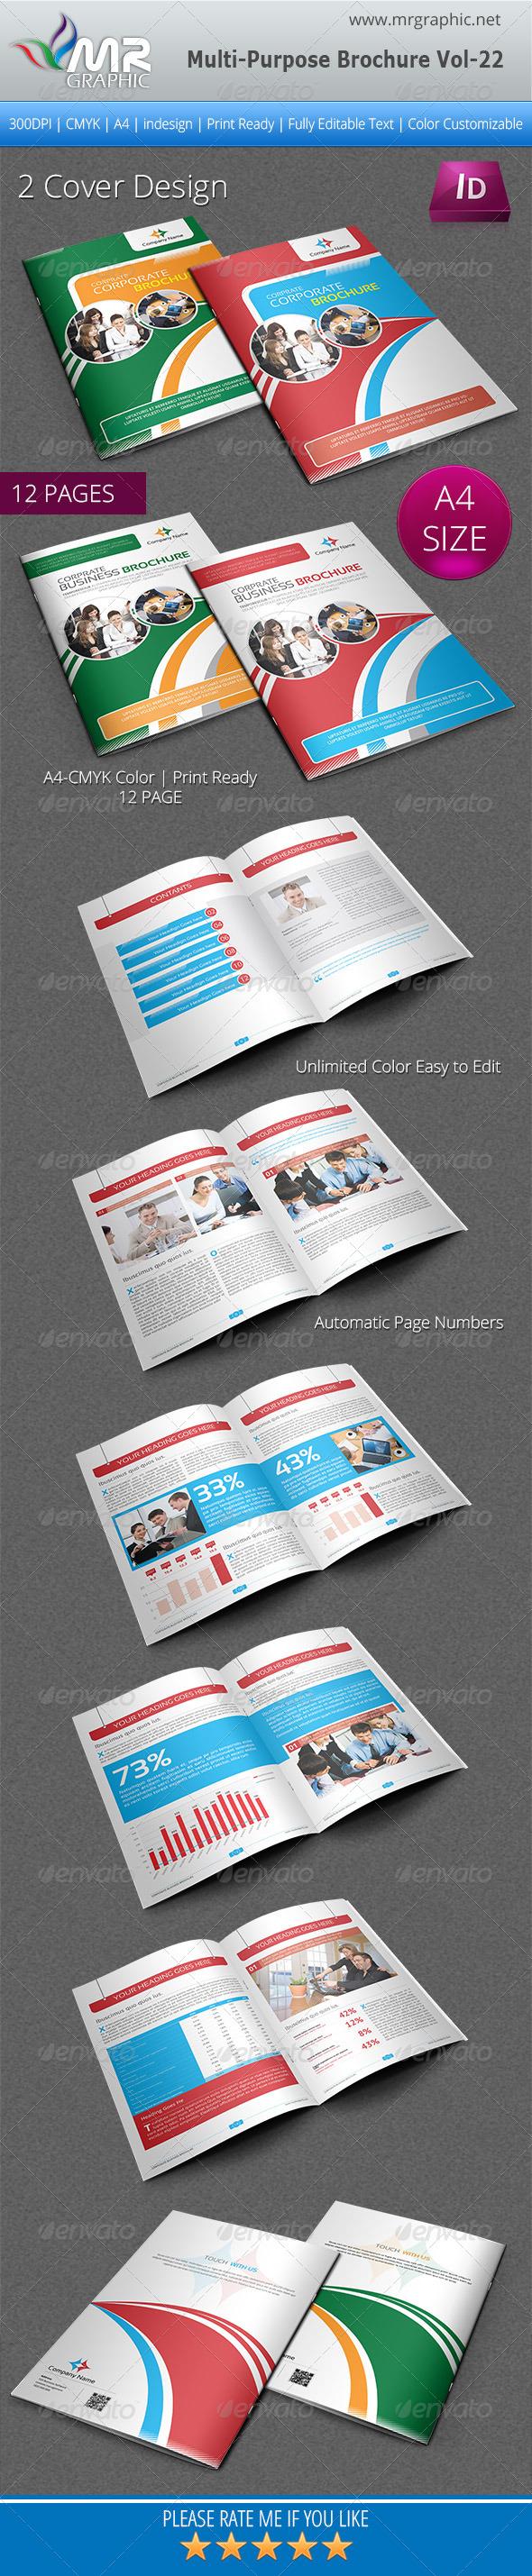 Multipurpose Business Brochure Template Vol-22 - Corporate Brochures